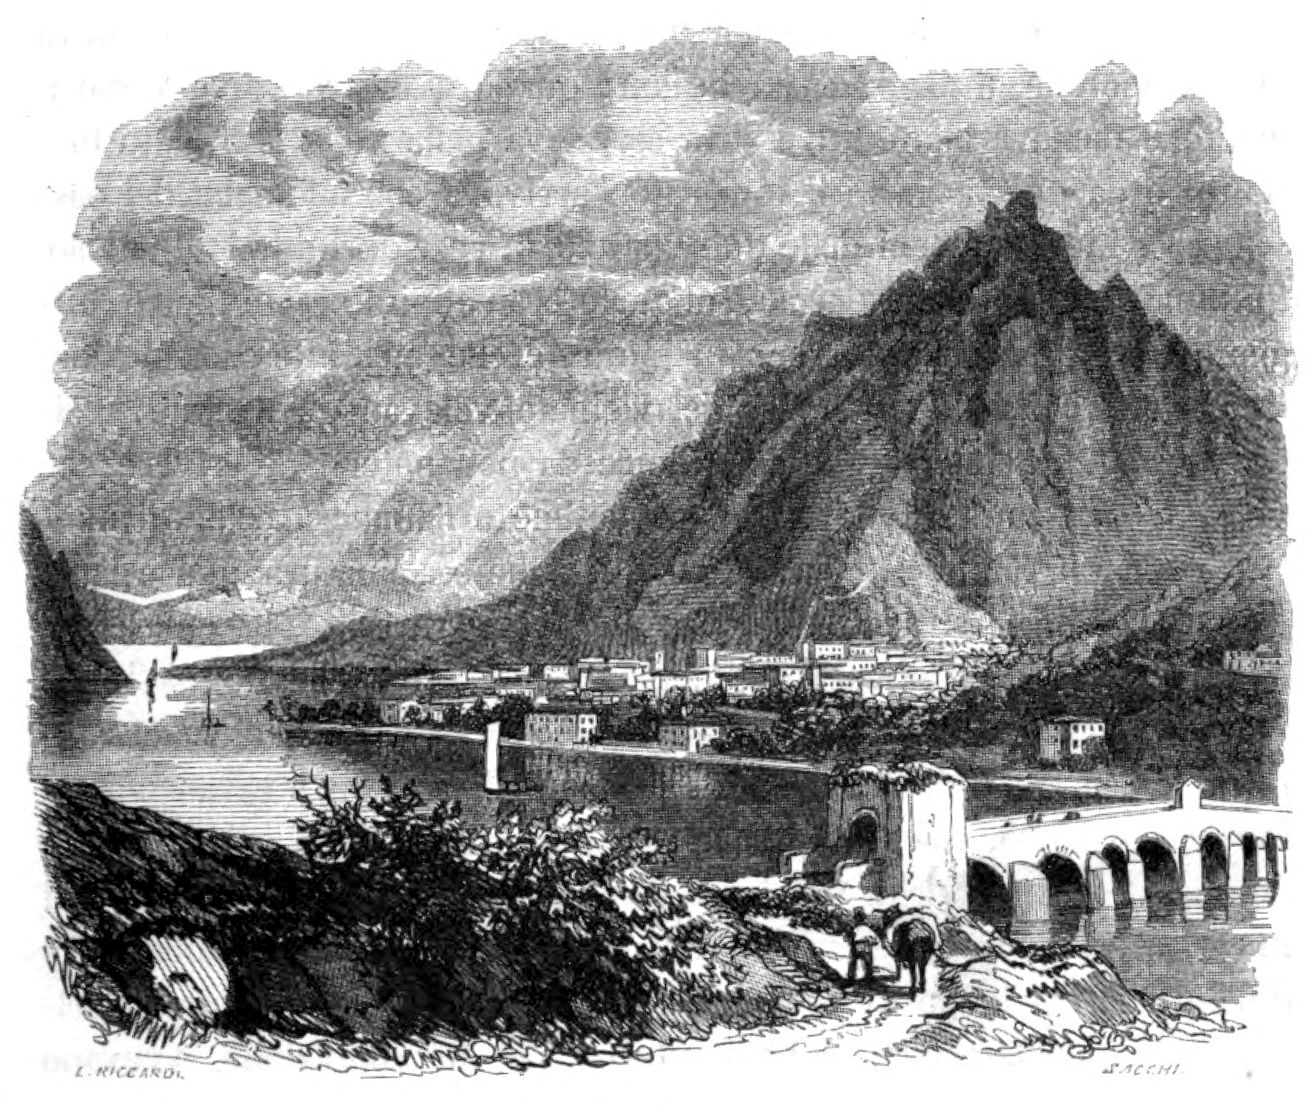 FileI promessi sposi  Lake Comojpg  Wikimedia Commons